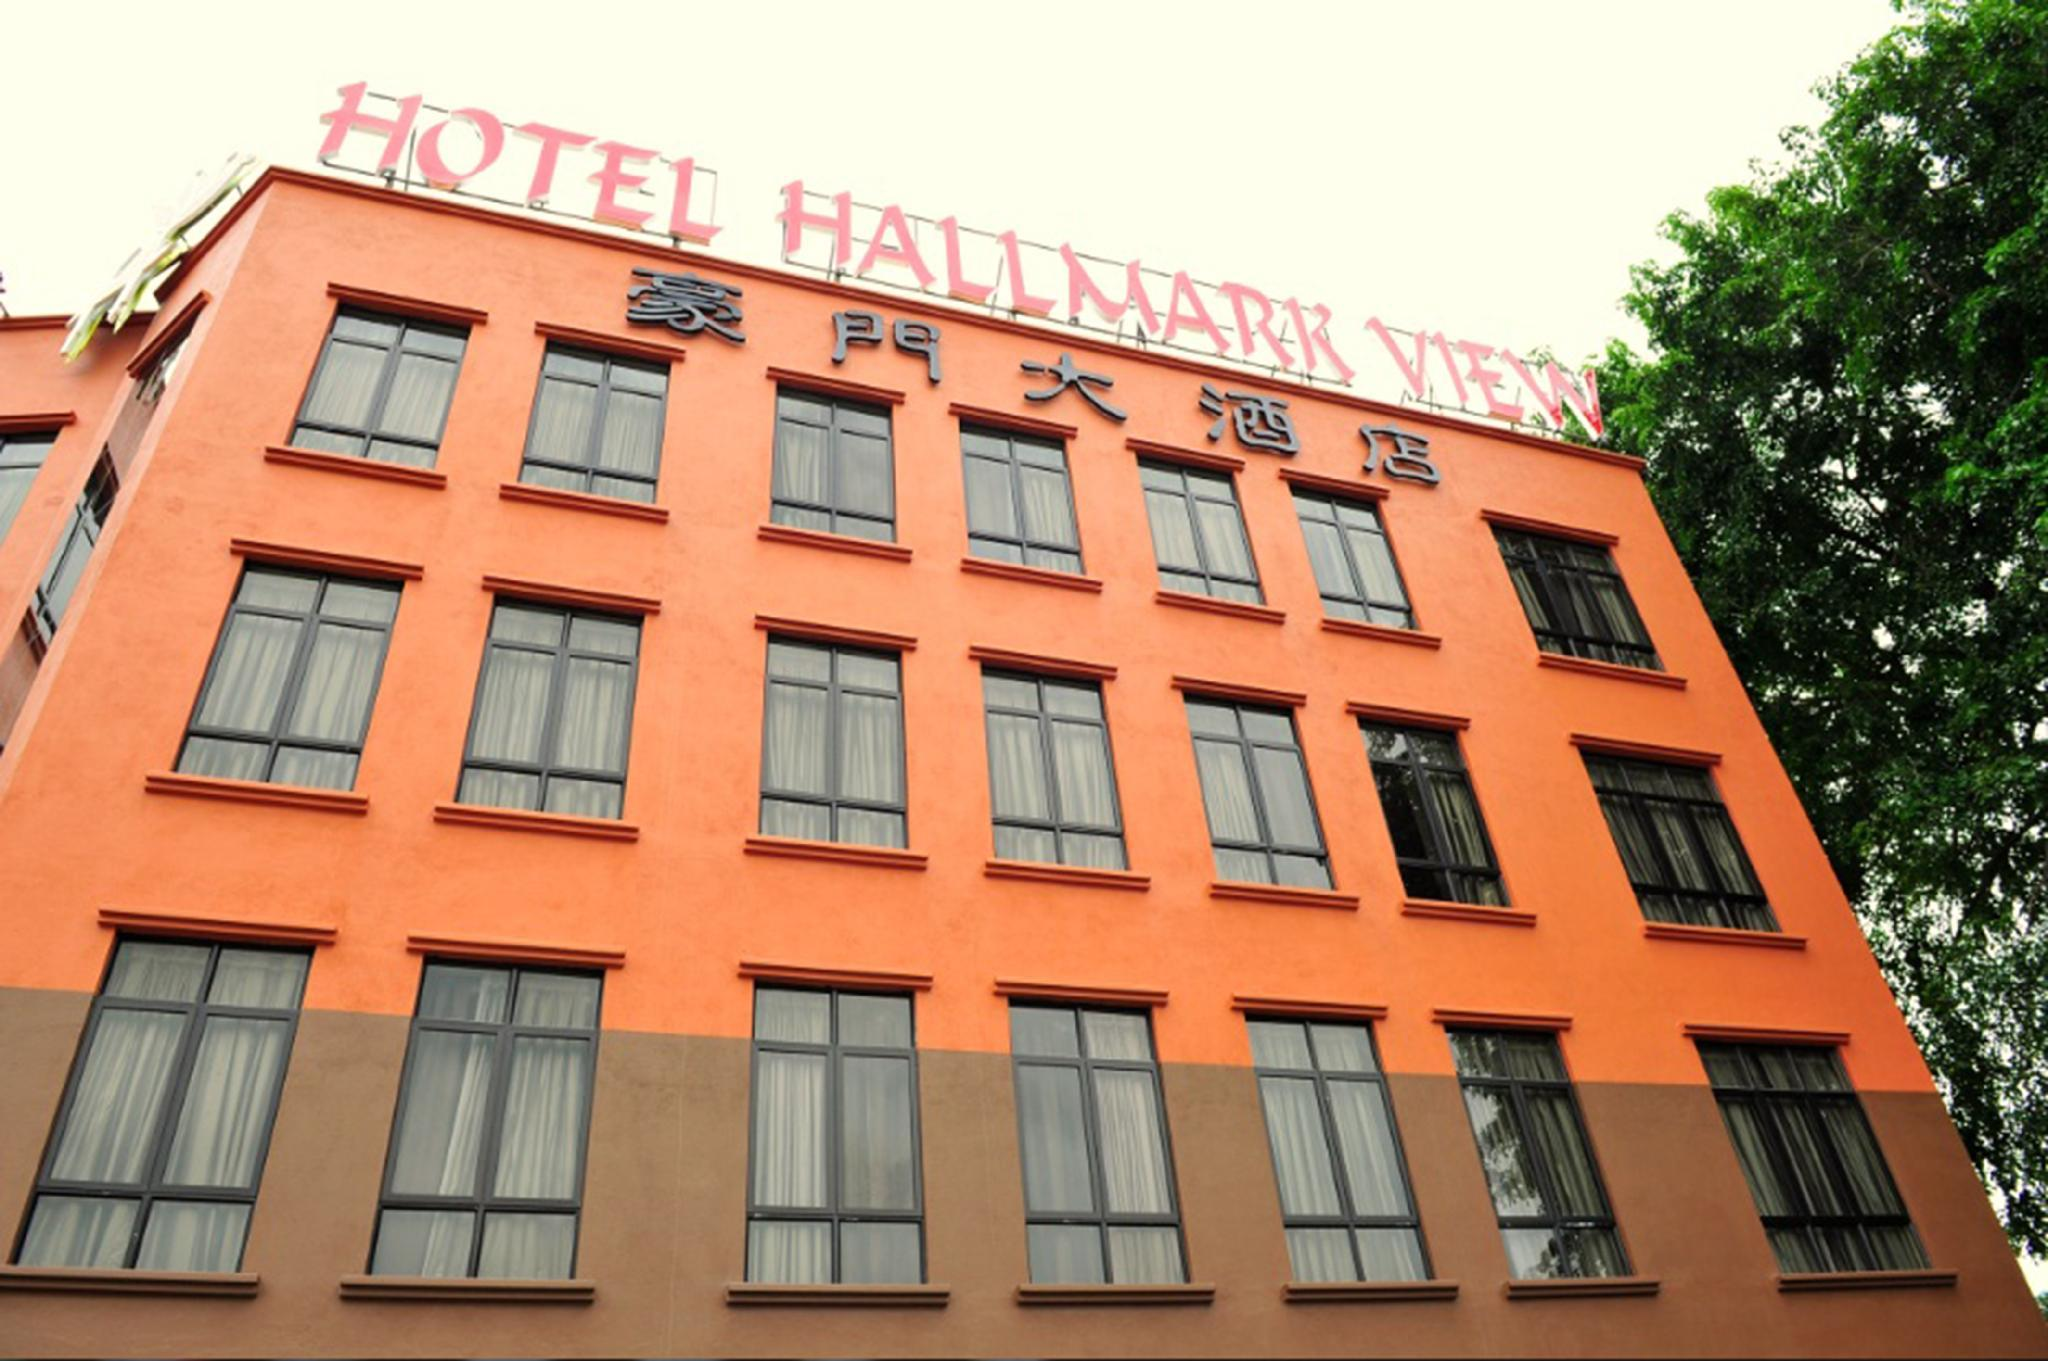 Hallmark View Hotel, Kota Melaka